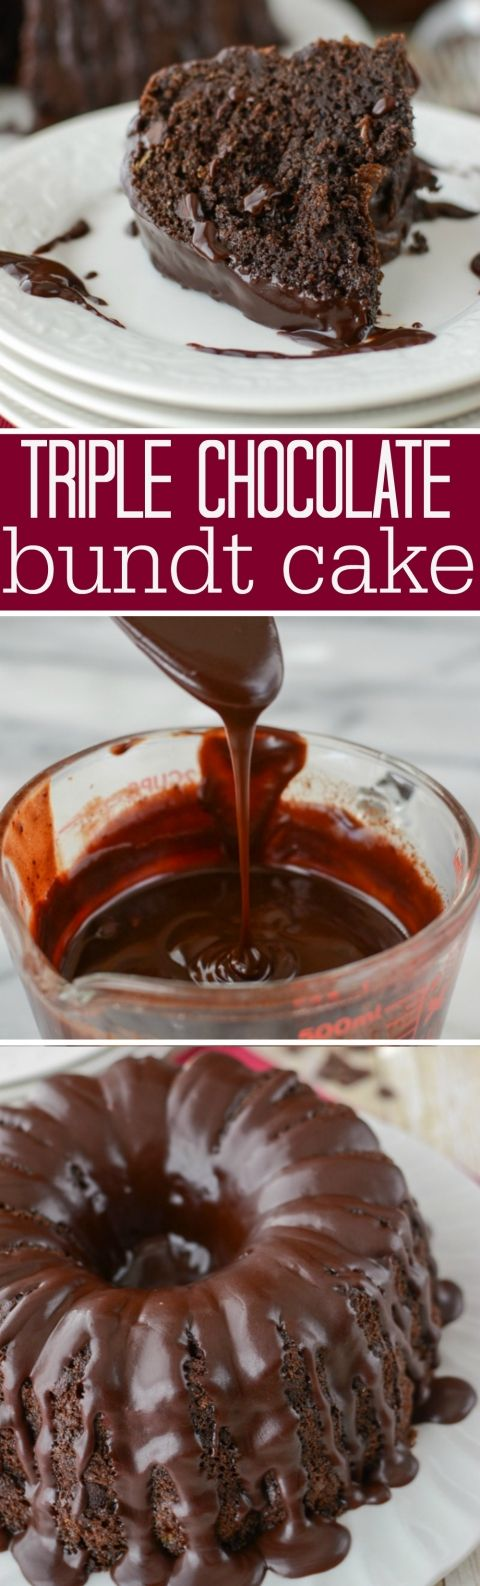 Super Moist Chocolate Bundt Cake Recipes